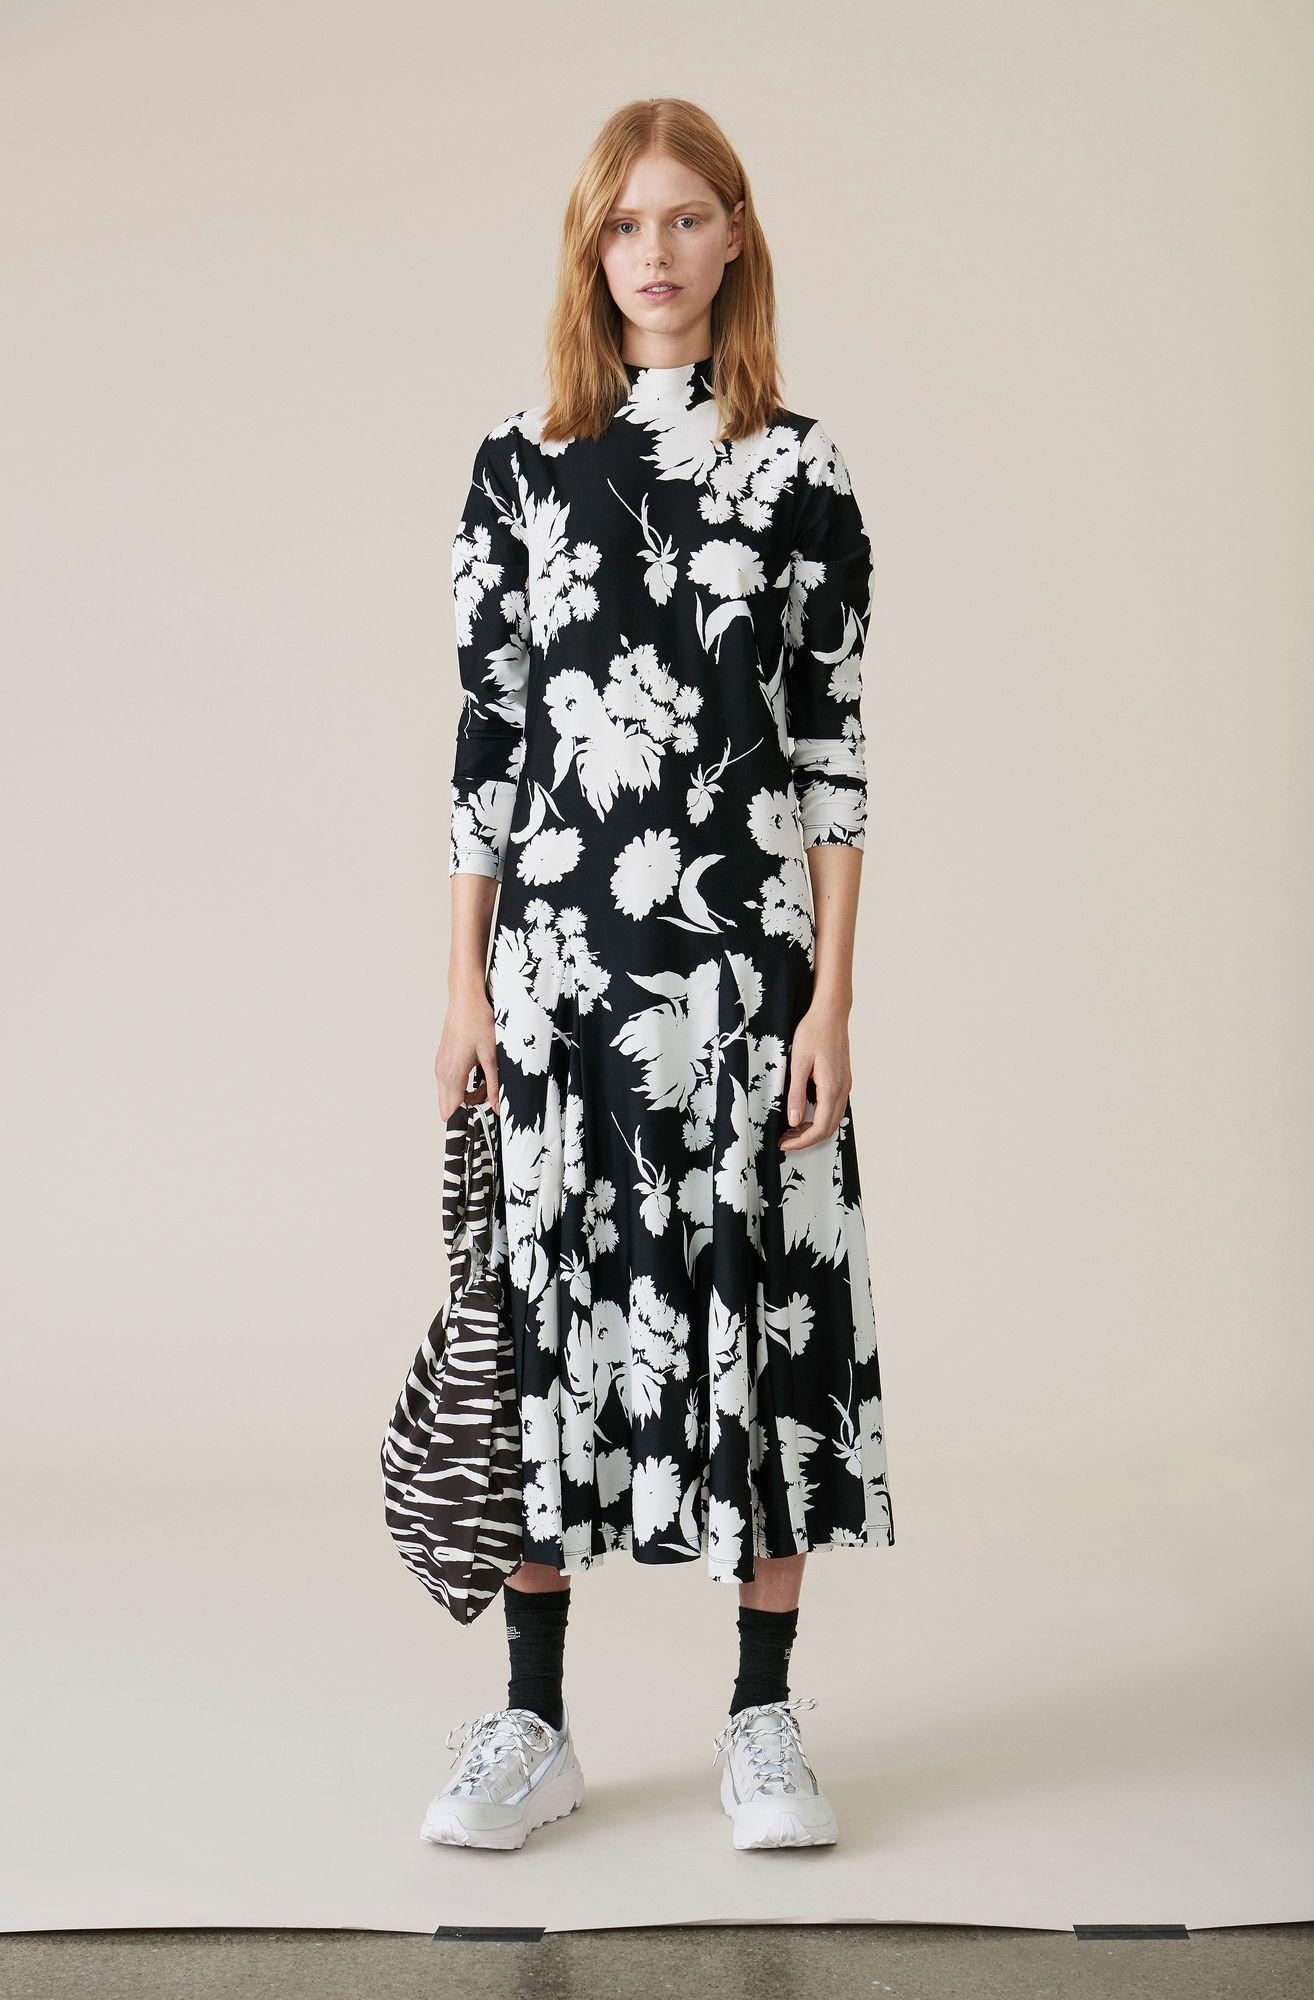 Maxi dress with a wide skirt, hight collar and zipper